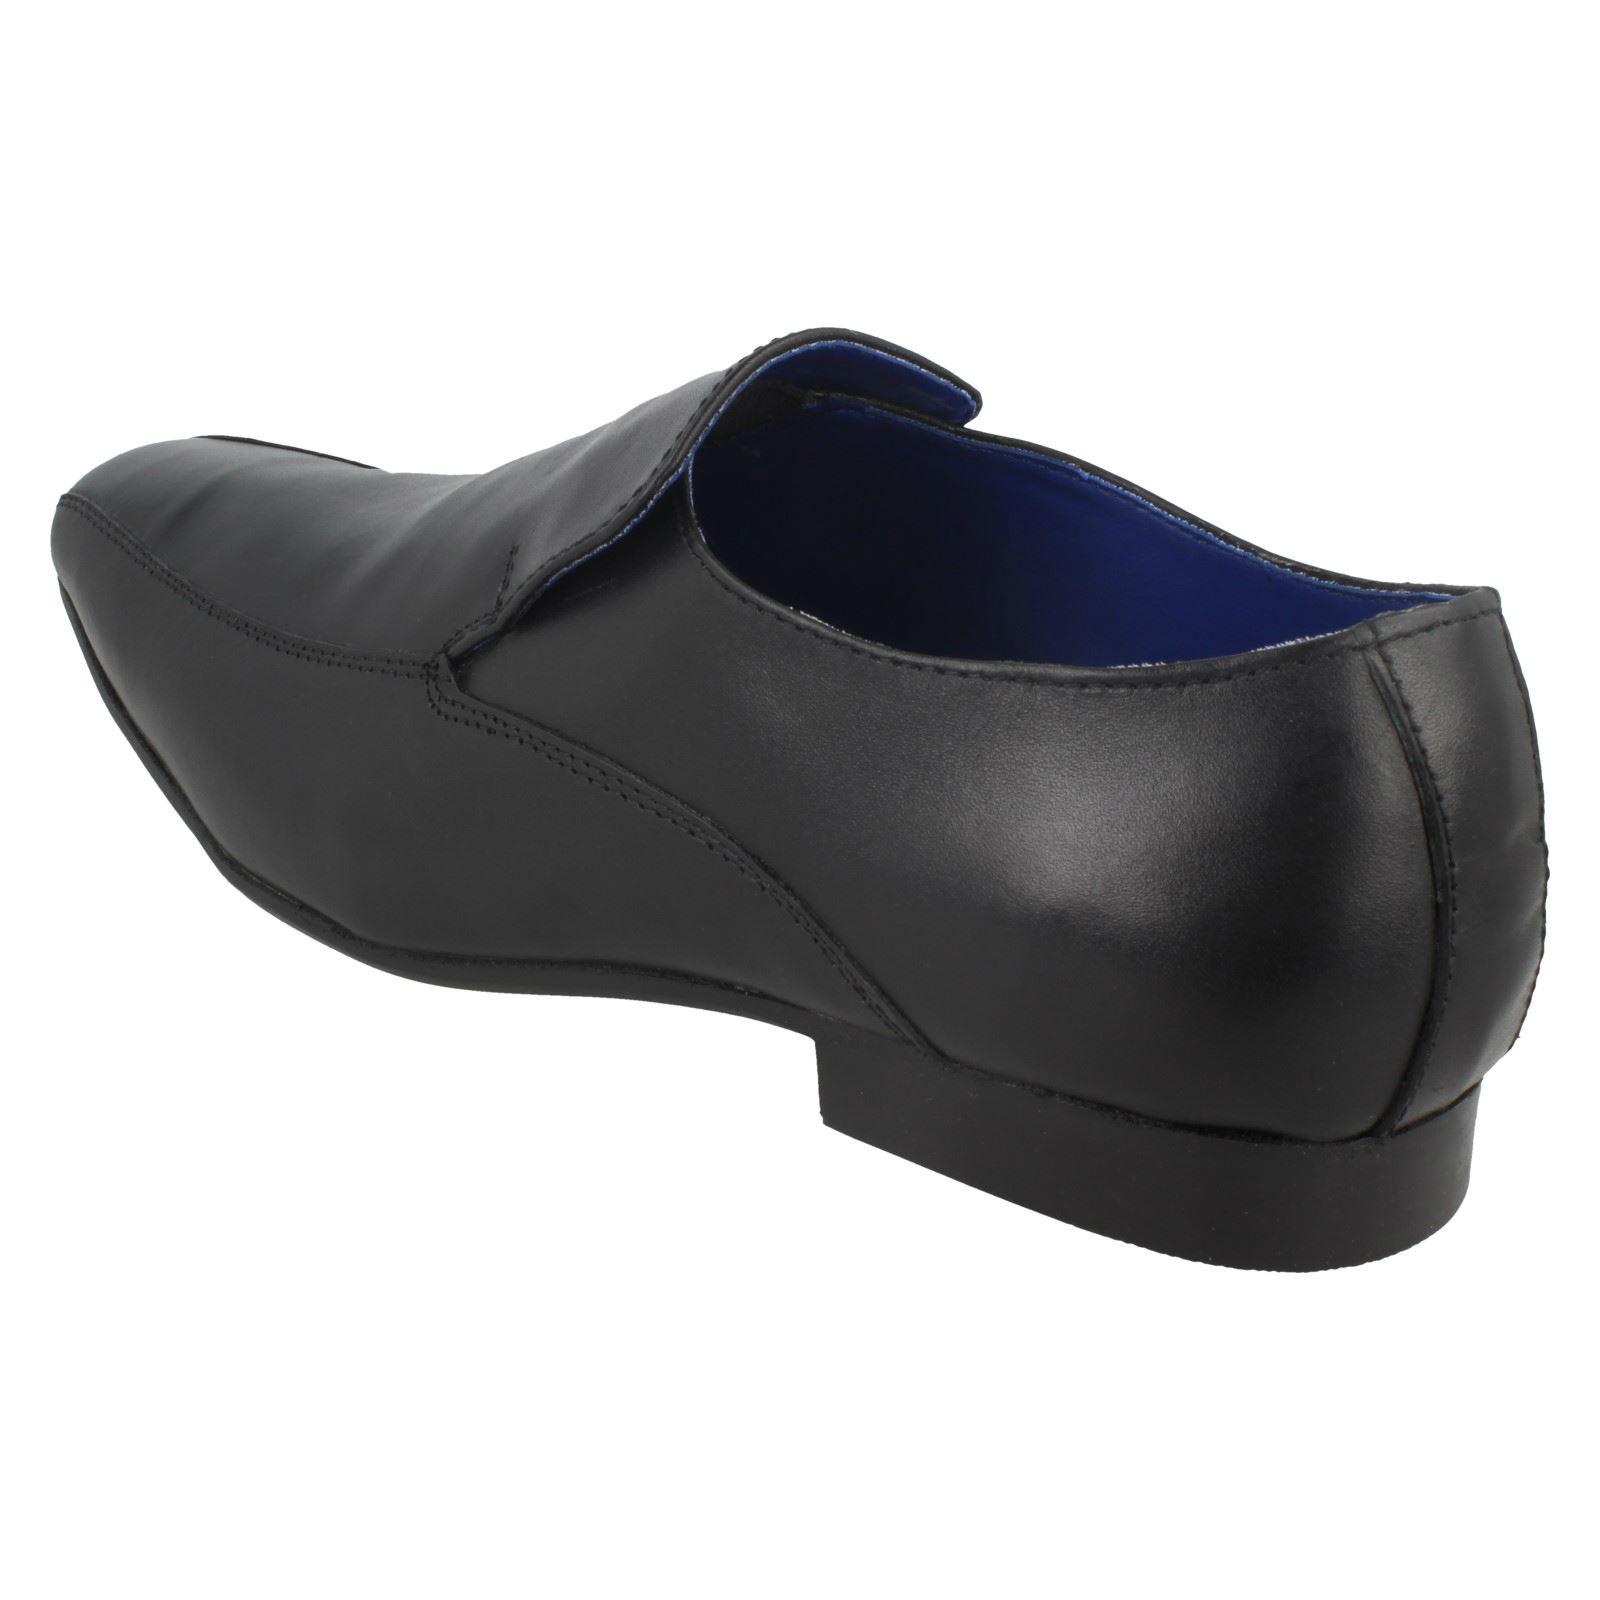 Mens Ps506 Work Shoes Black Smart Psl OwzBwqYSf